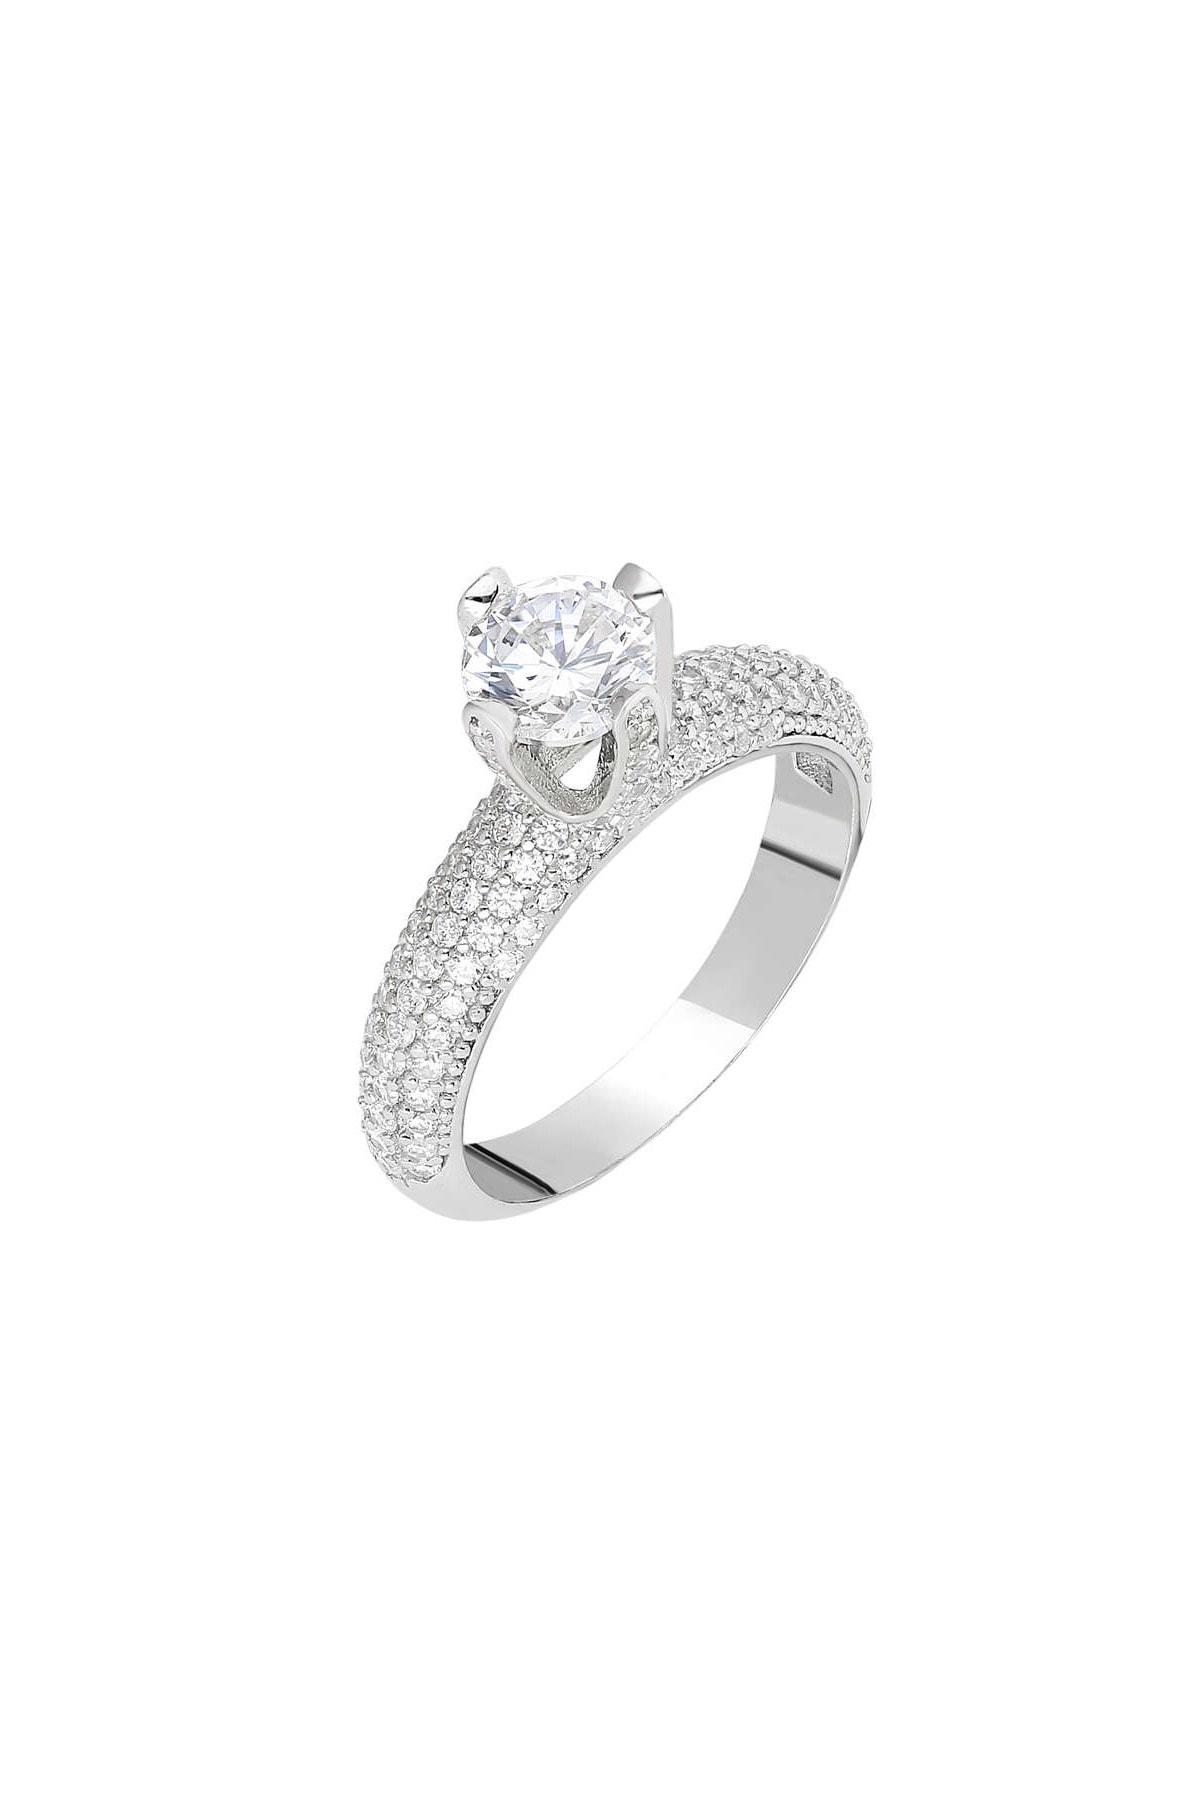 Tesbihane Starlight Diamond Pırlanta Montür Aşk Temalı 925 Ayar Gümüş Bayan Tektaş Yüzük 102001800 3